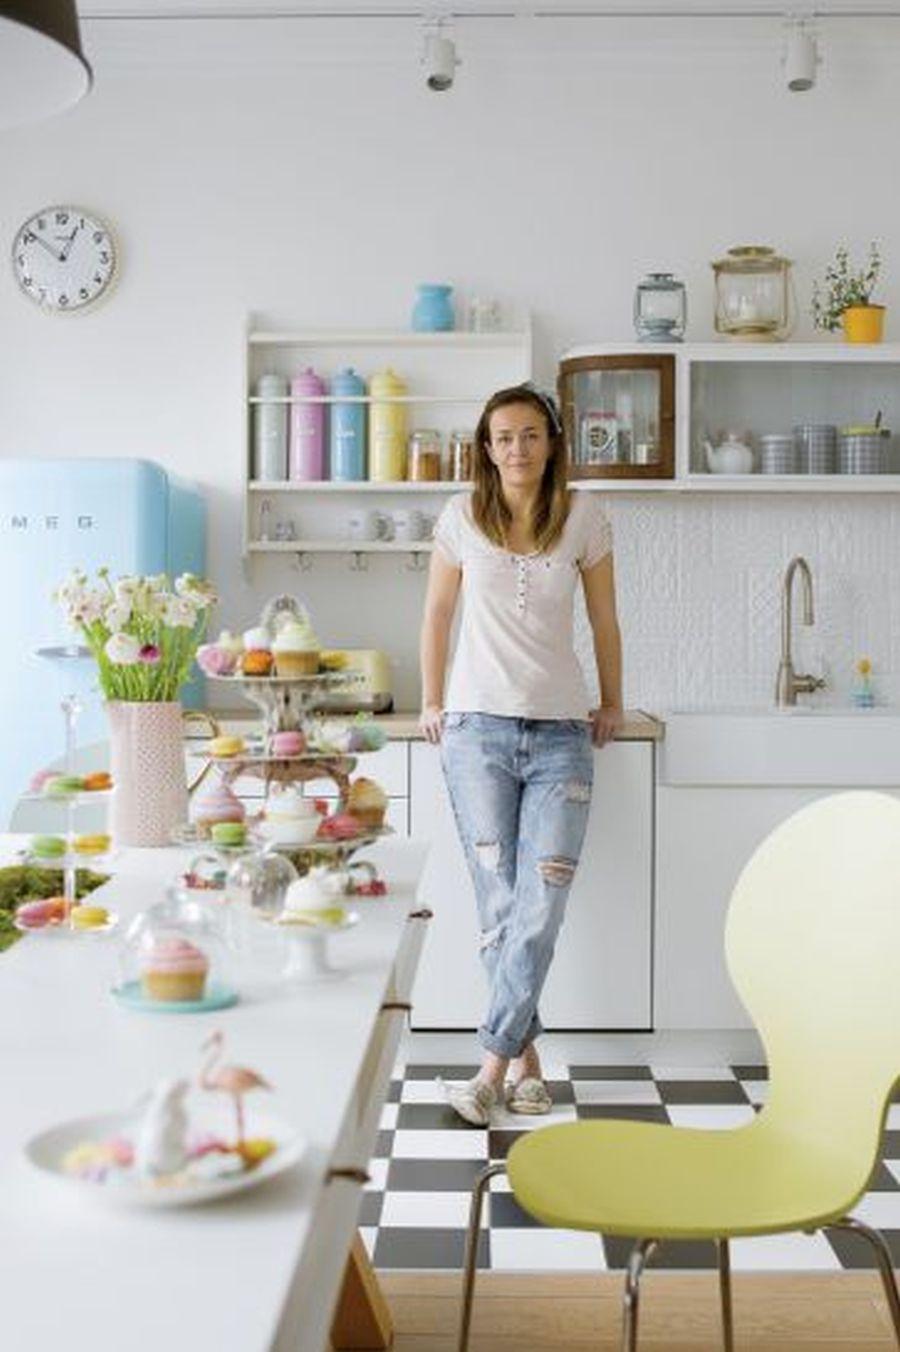 adelaparvu.com despre apartament in culori pastelate, Designer Patricia Rabinska, Foto Yassen Hristov (8)